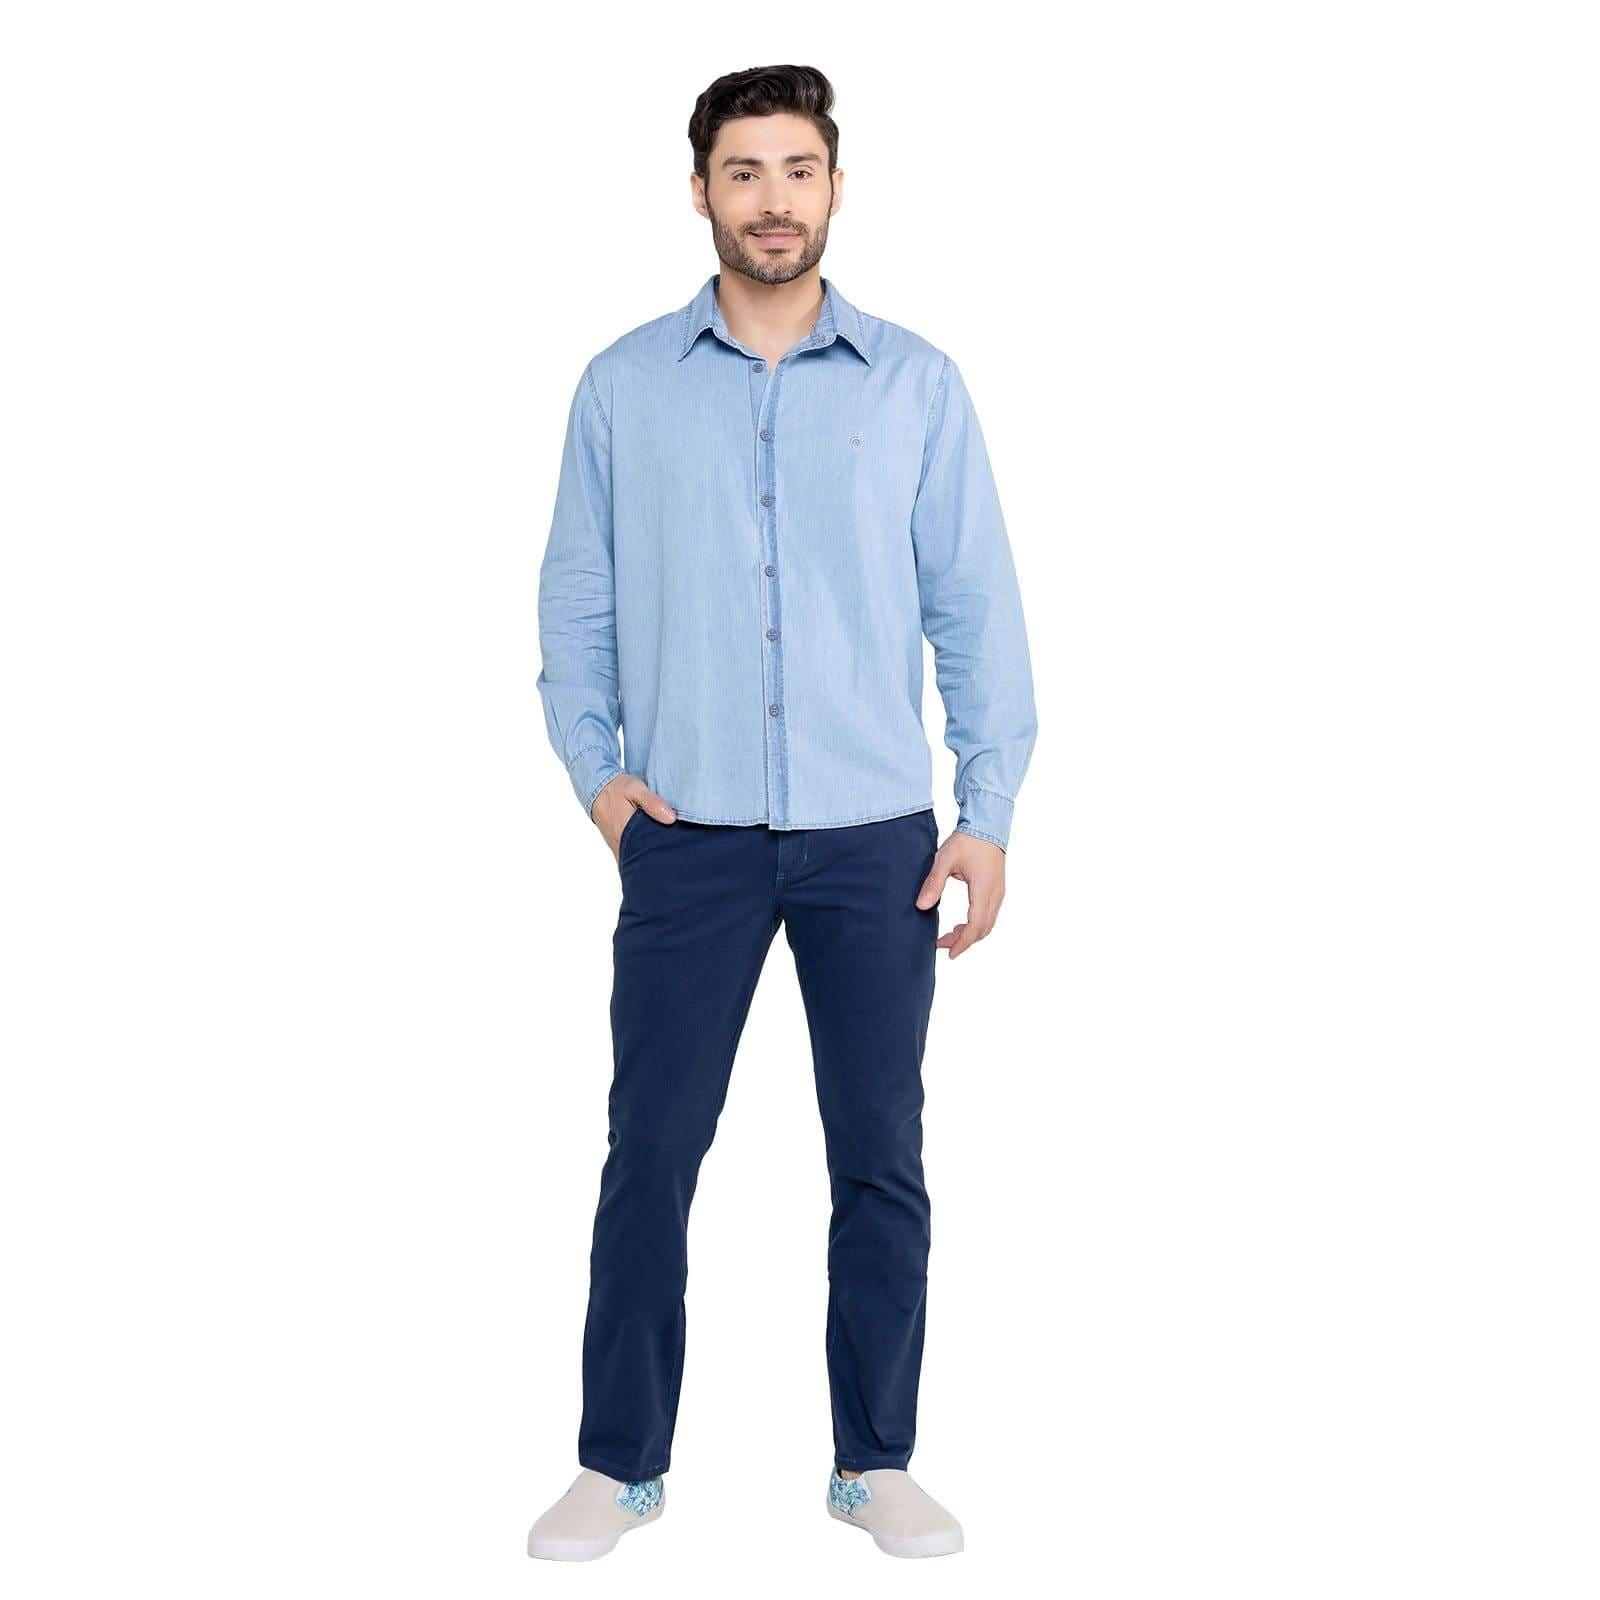 Camisa Jeans Masculina Manga Longa Jeans Claro